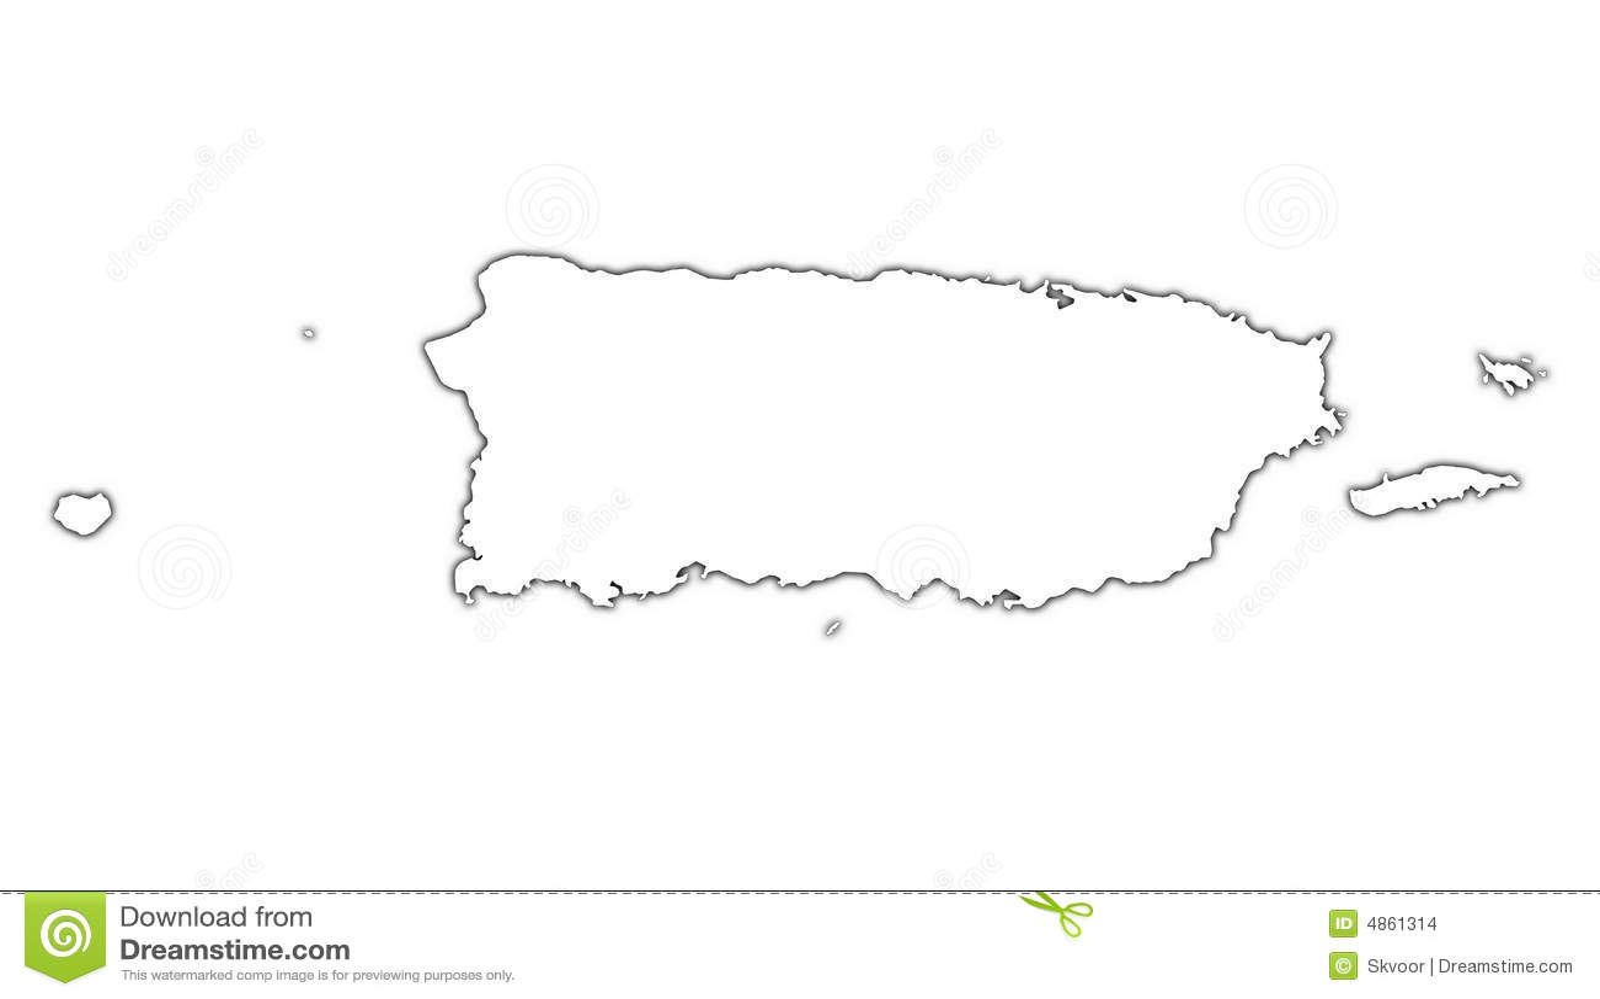 Puerto Rico Outline Map Stock Illustration Illustration